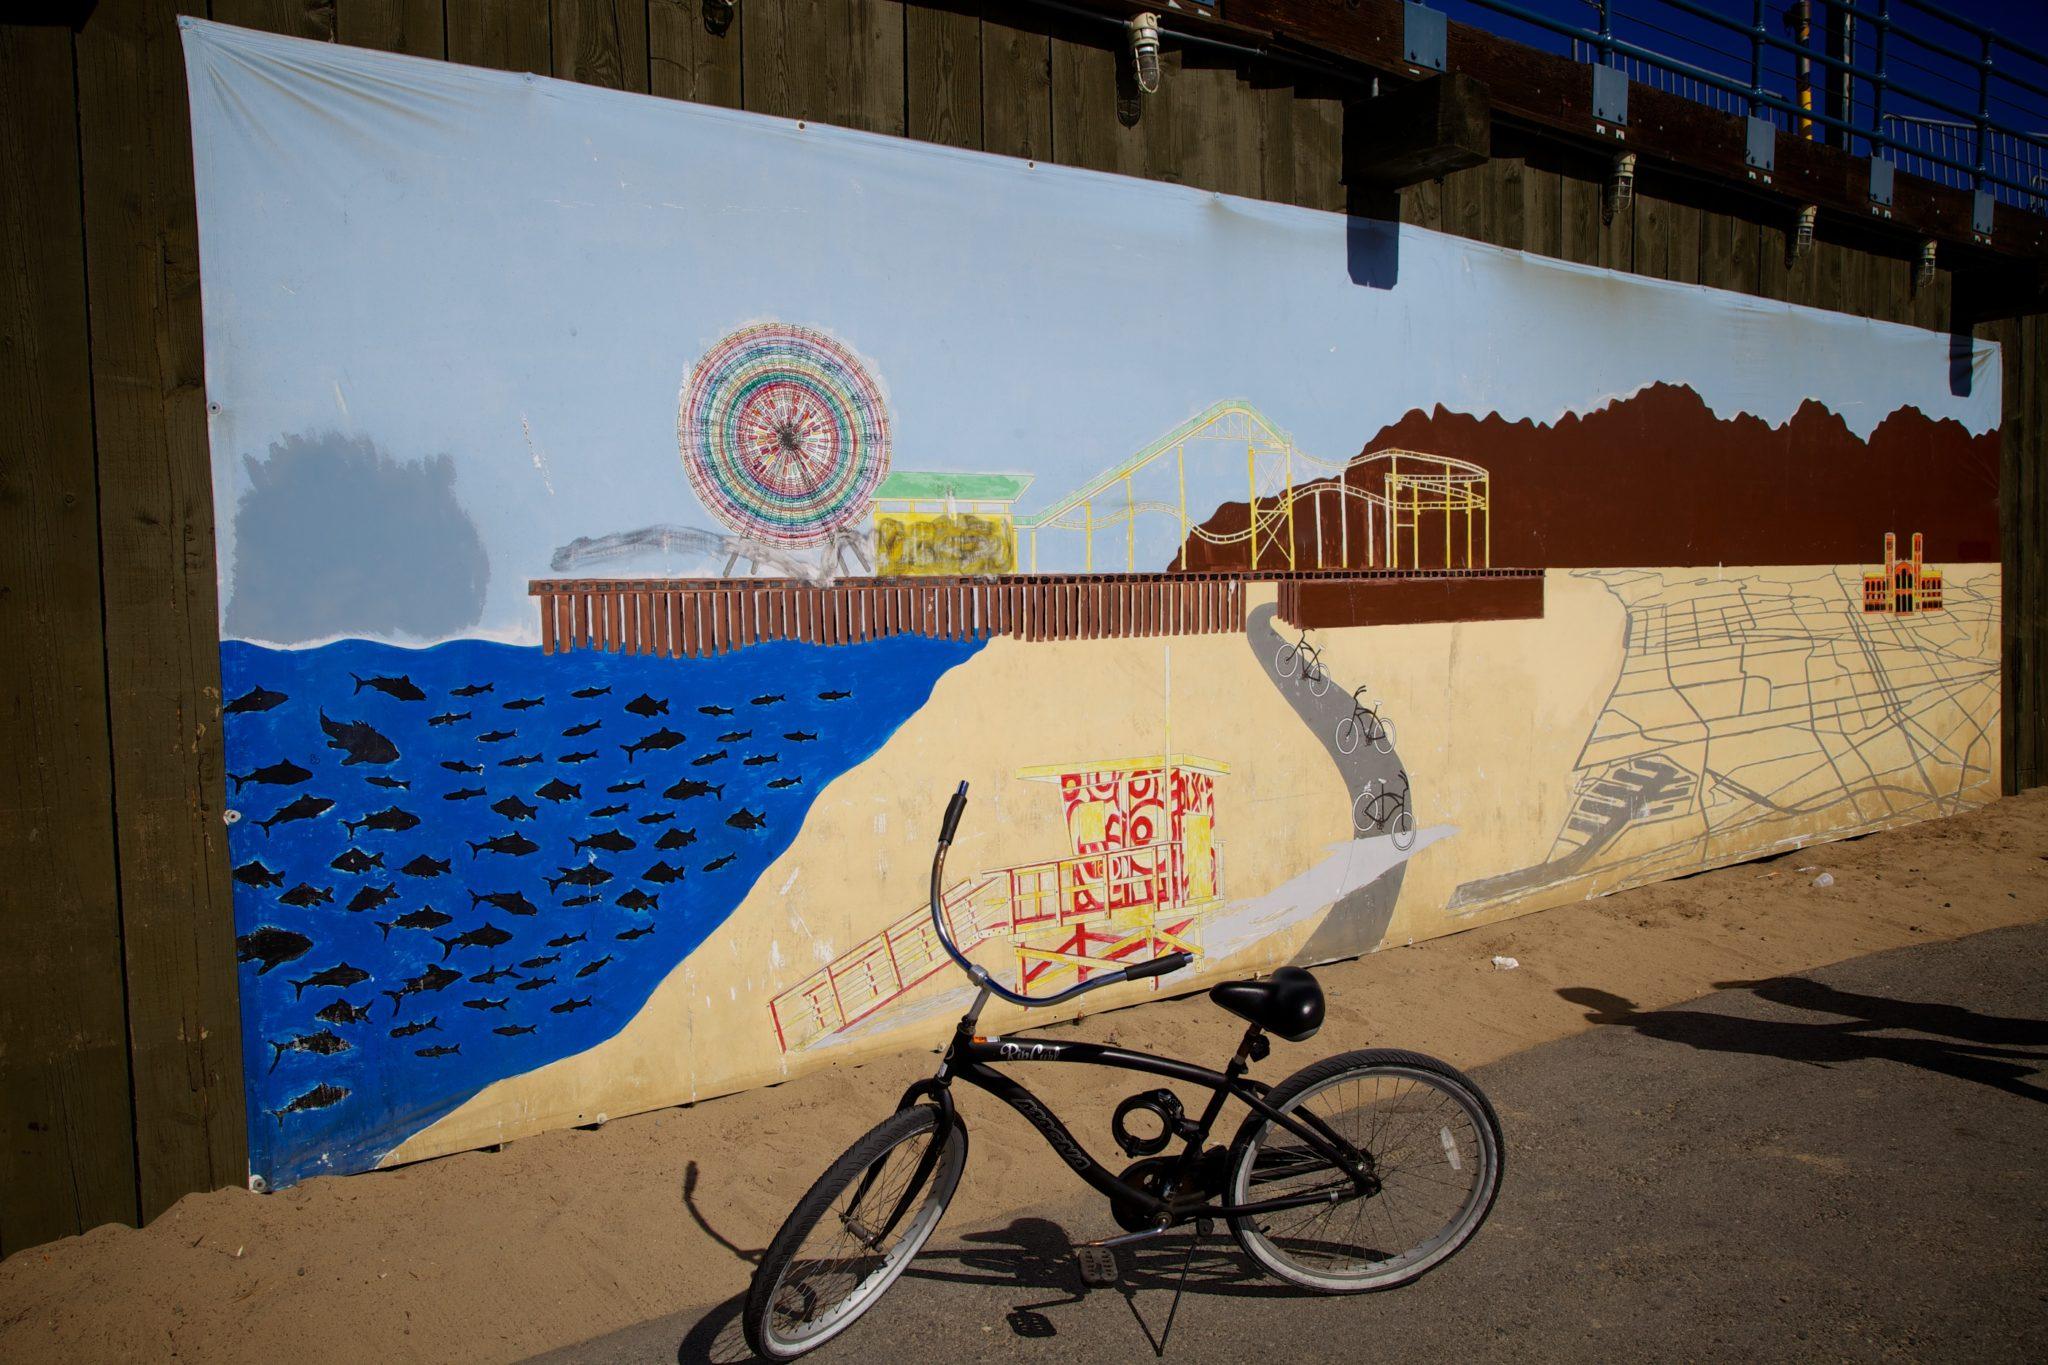 Santa Monica bike path to The Pier